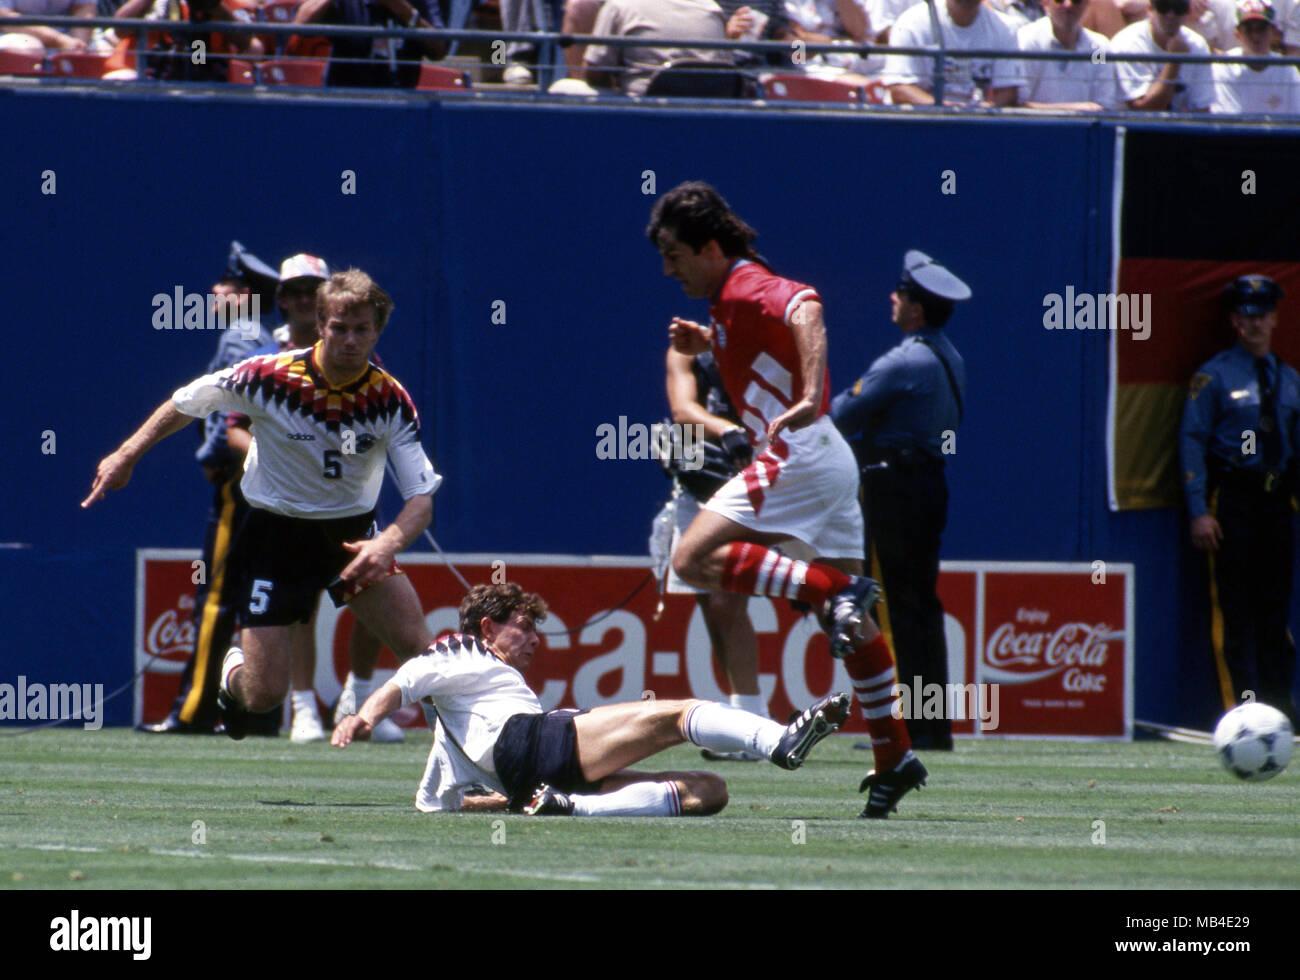 6d51091b908 FIFA World Cup - USA 1994 10.7.1994, Giants Stadium, New York/